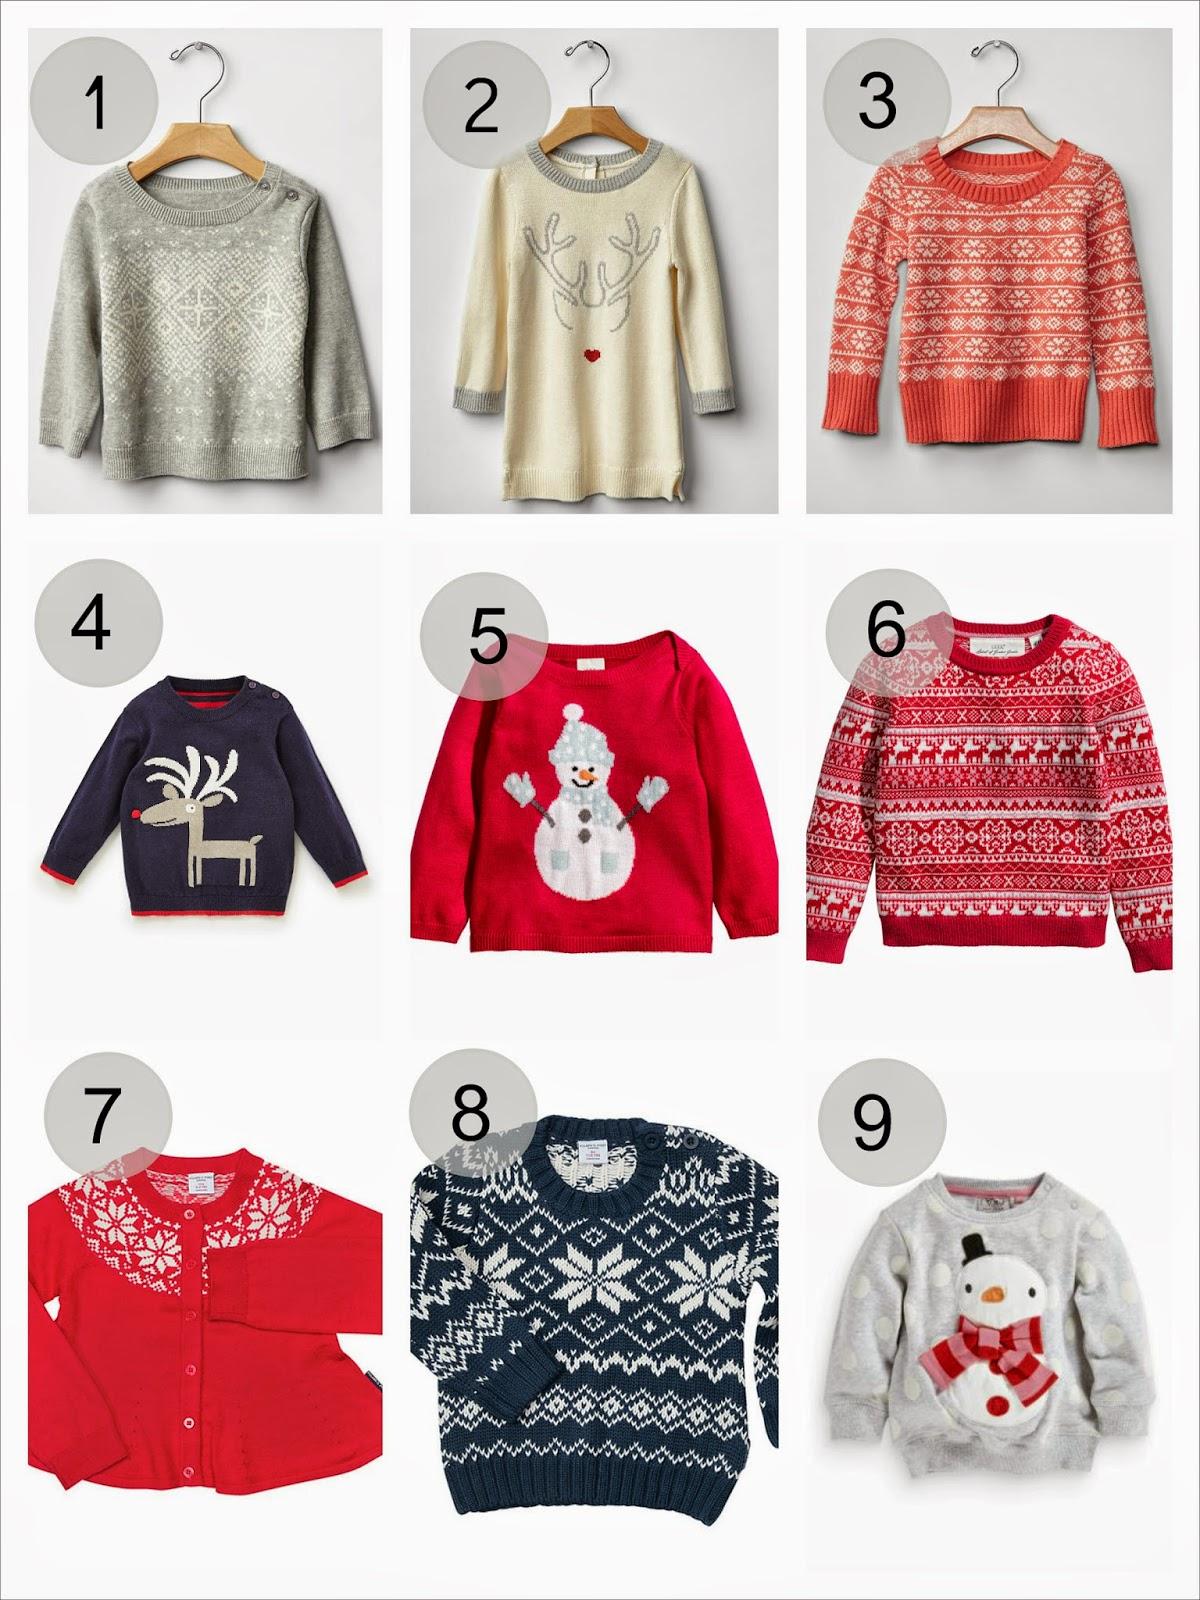 eb459629ec4a Coral fair isle sweater: Gap / 4. Reindeer jumper: M&S / 5. Snowman jumper:  H&M / 6. Red reindeer motive jumper: H&M / 7. Girl's Christmas cardi: PoP /  8.